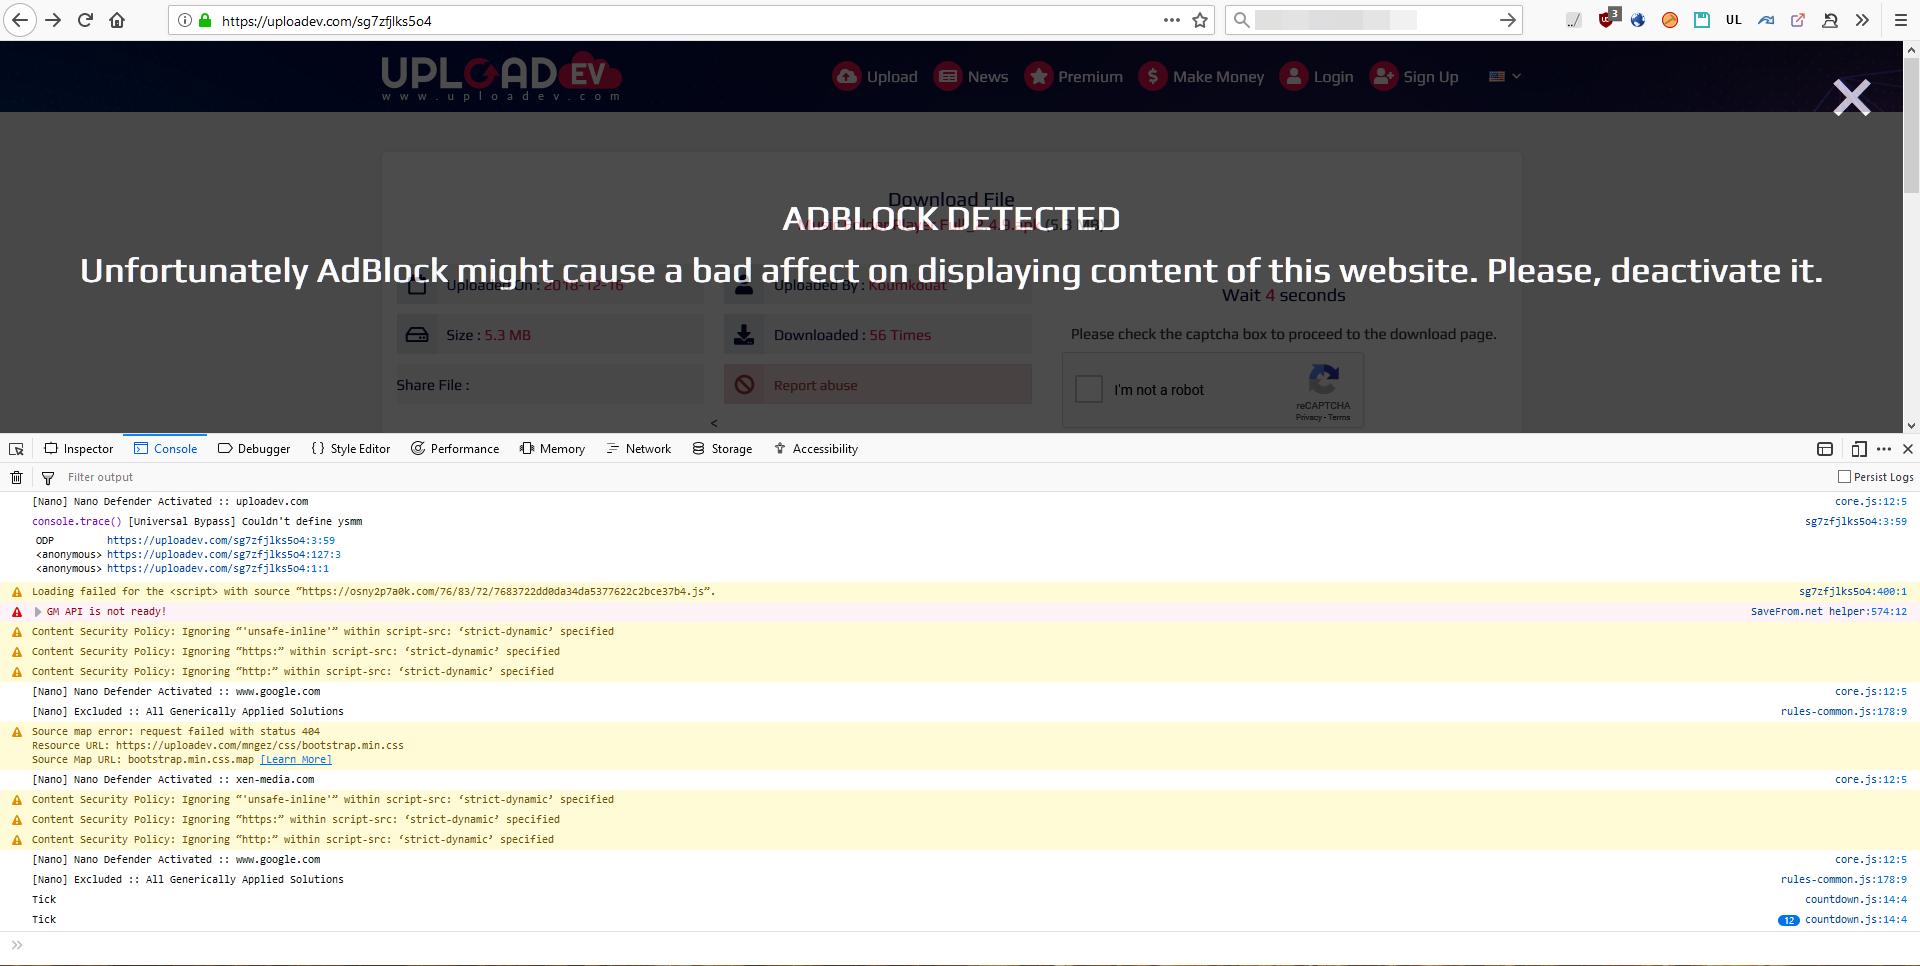 Anti-adblock] uploadev com · Issue #274 · NanoAdblocker